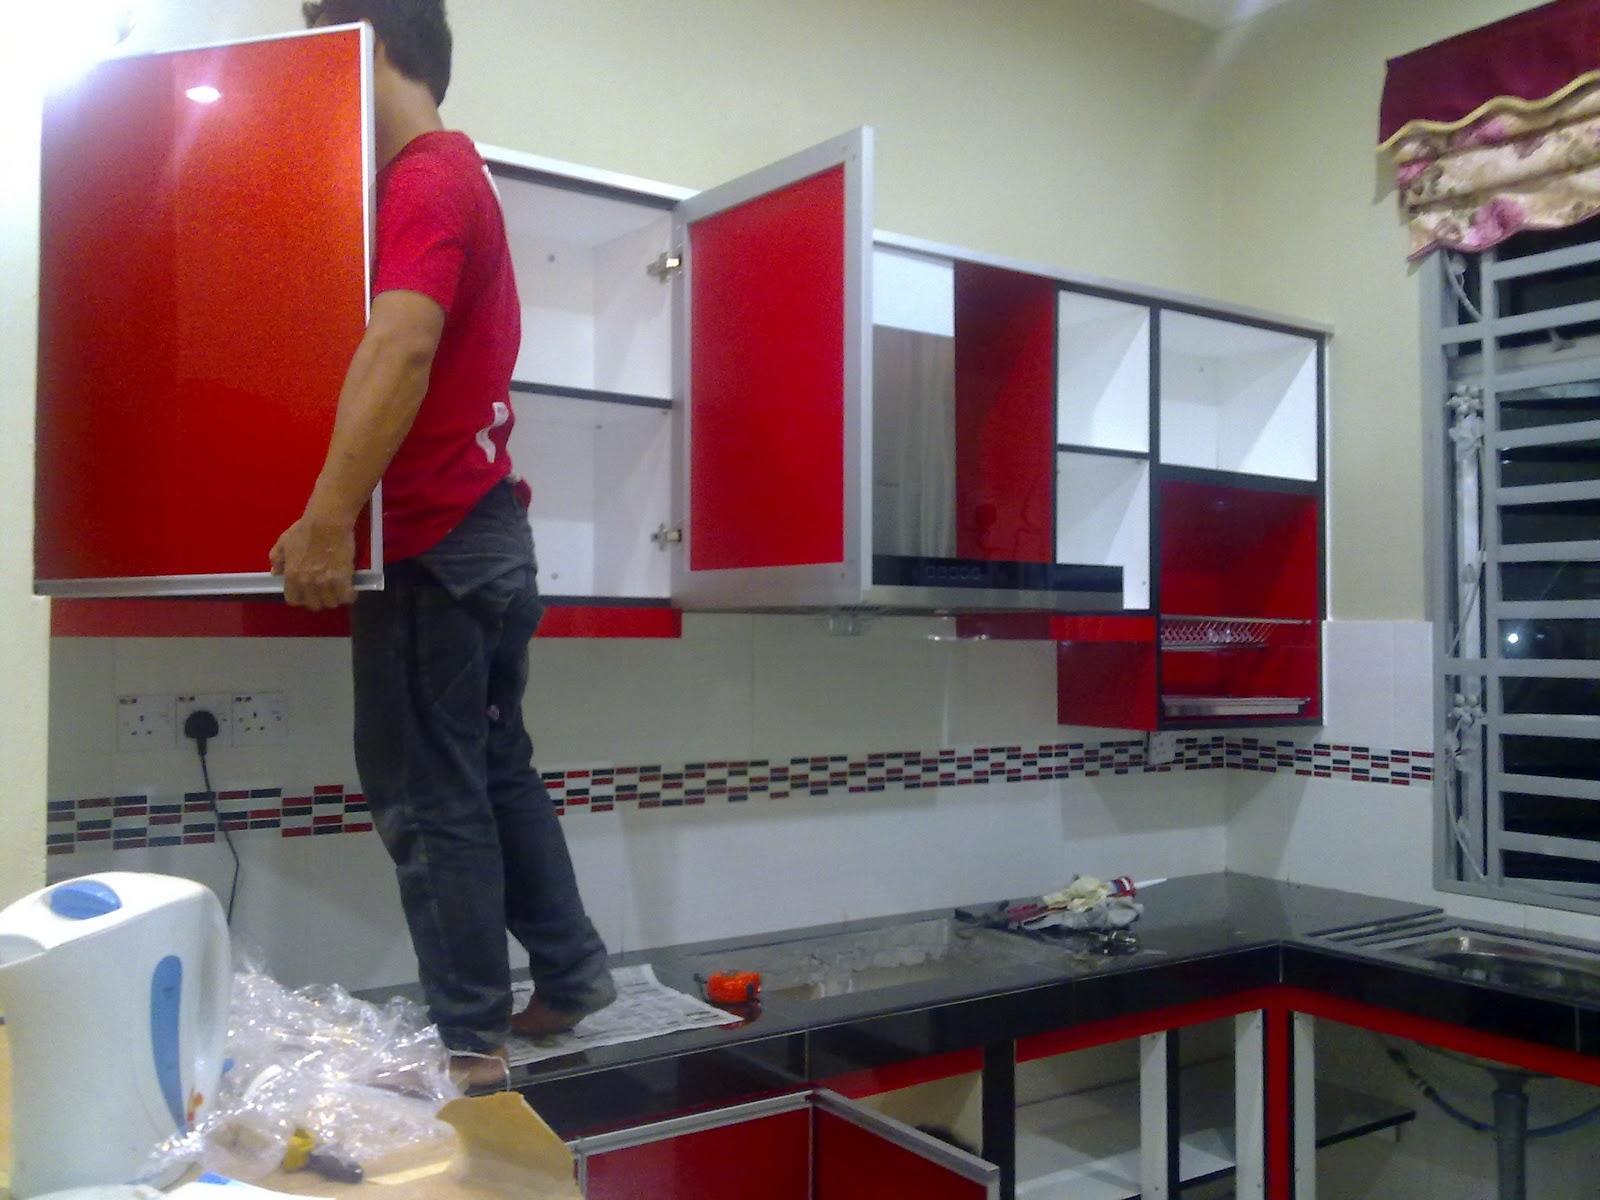 bajet utk kitchen cabini mmg over tinggi laaanak buek camno